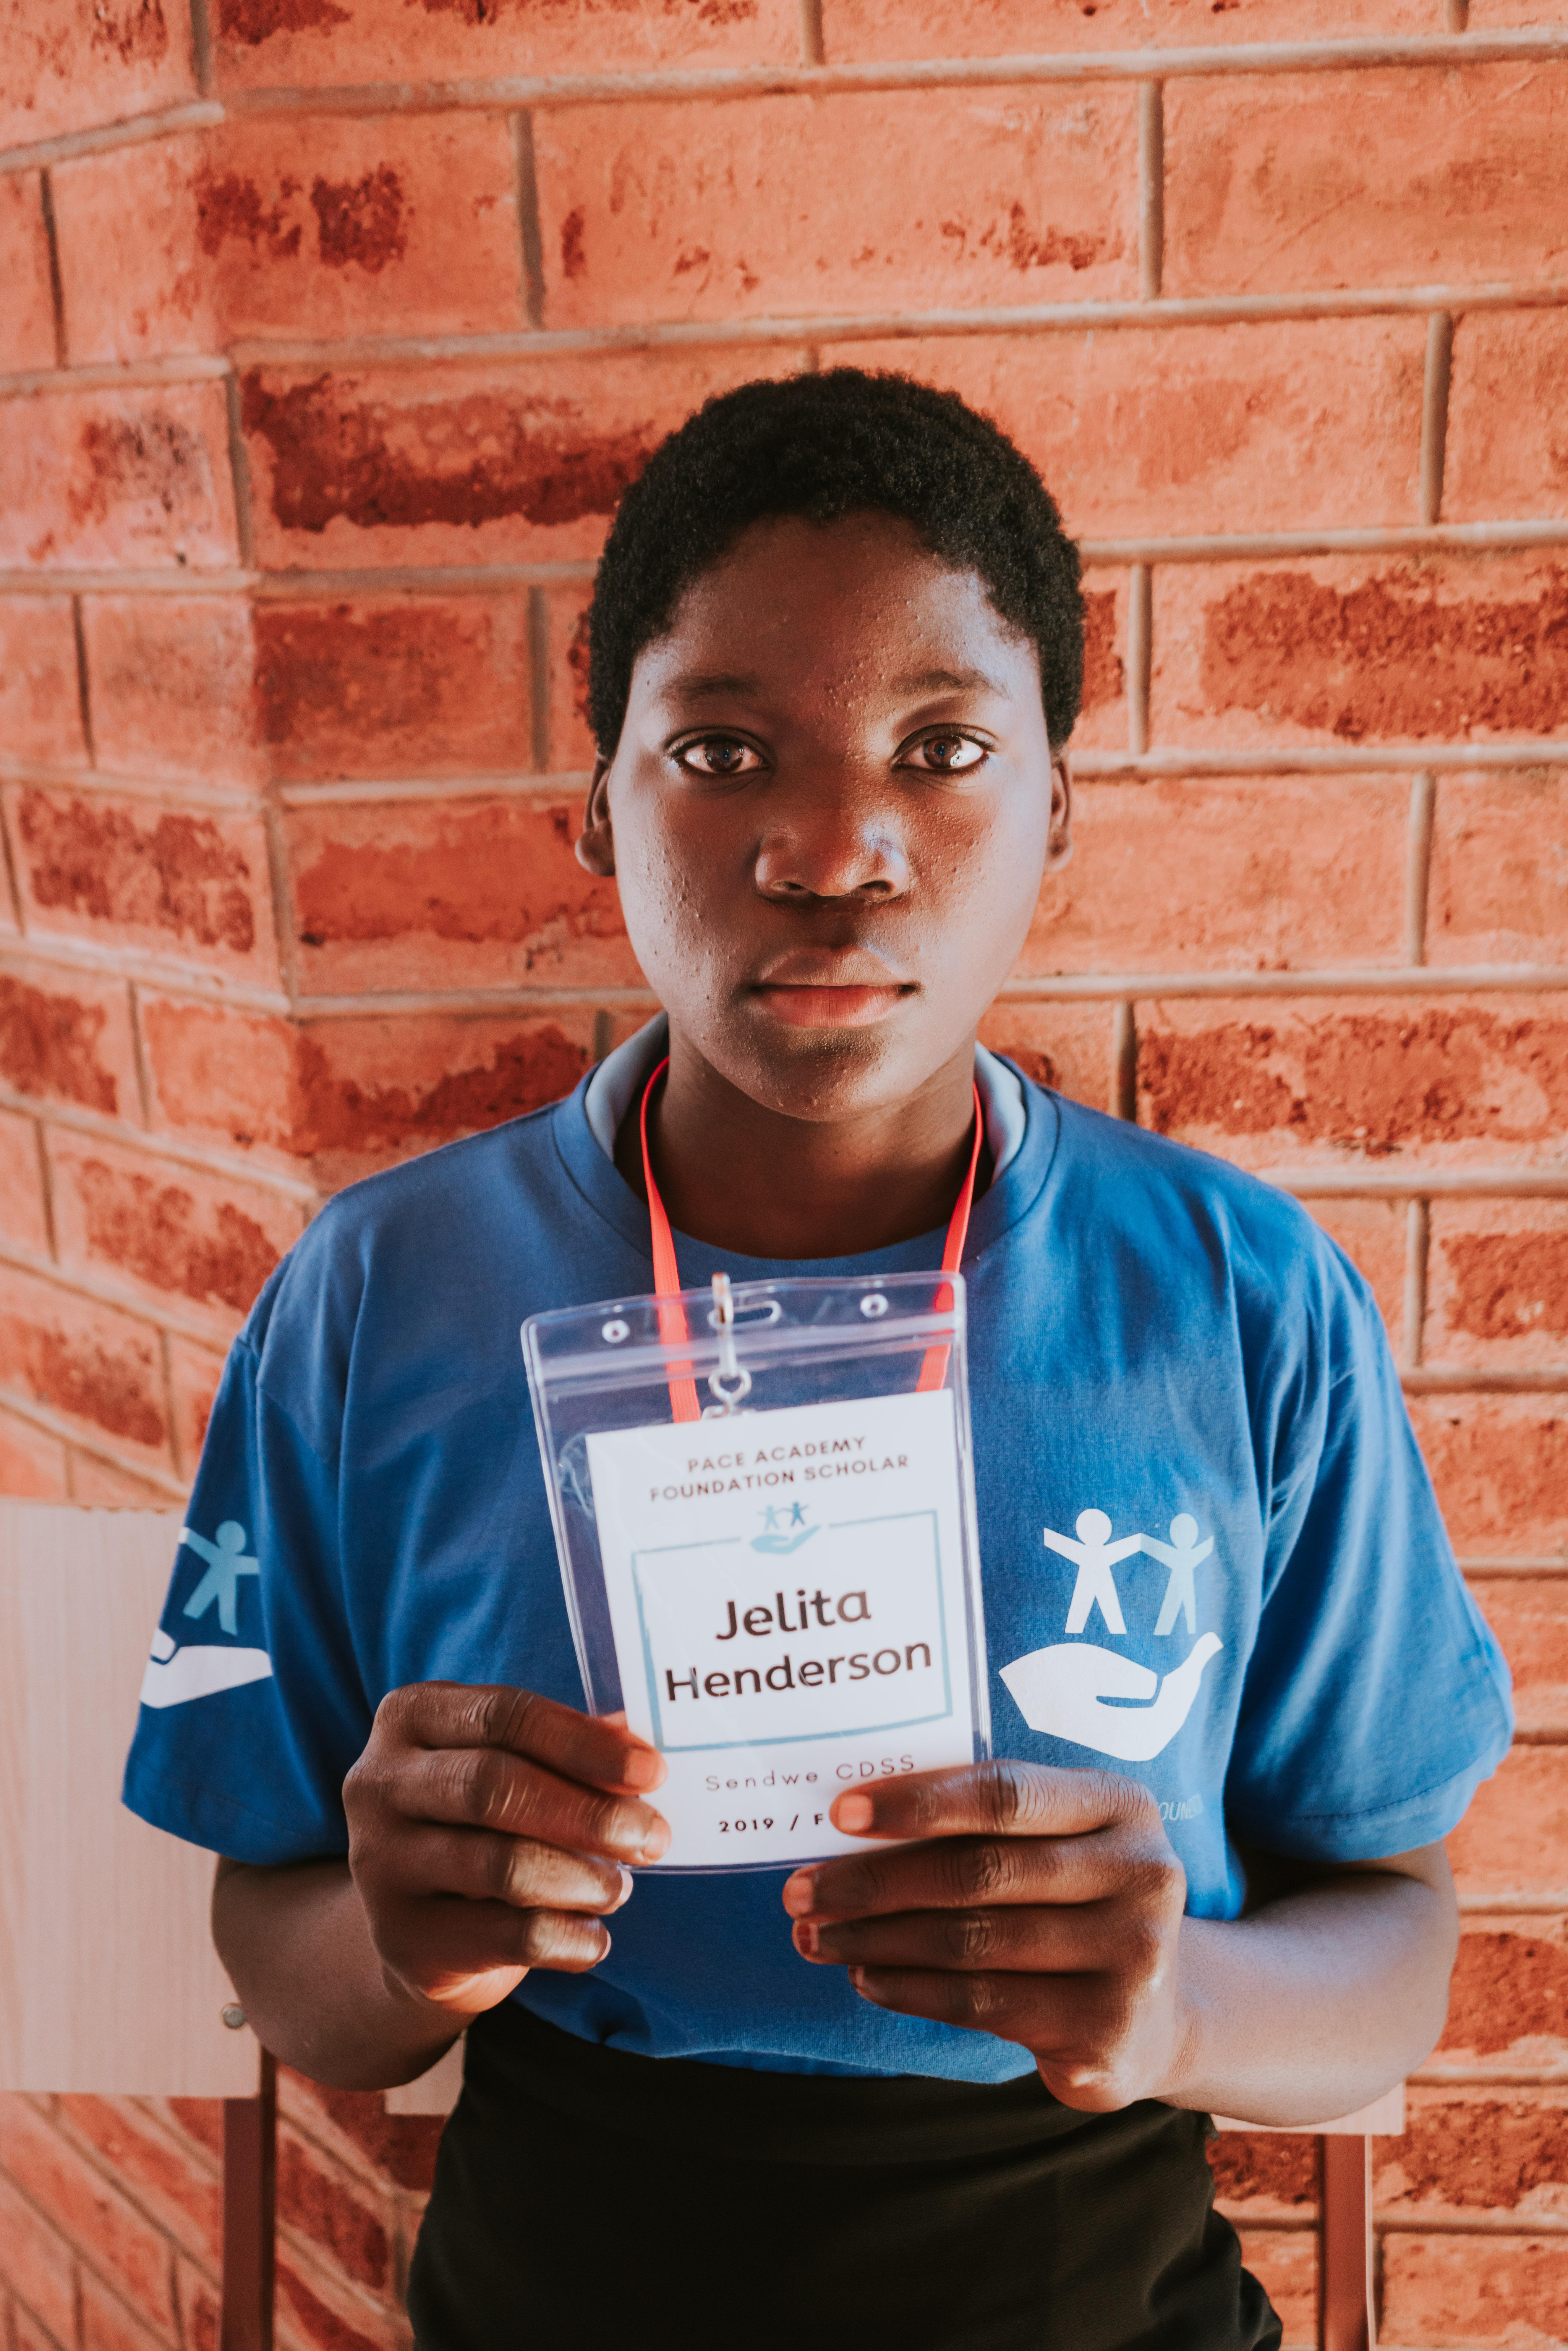 Jelita Henderson (Sendwe CDSS)